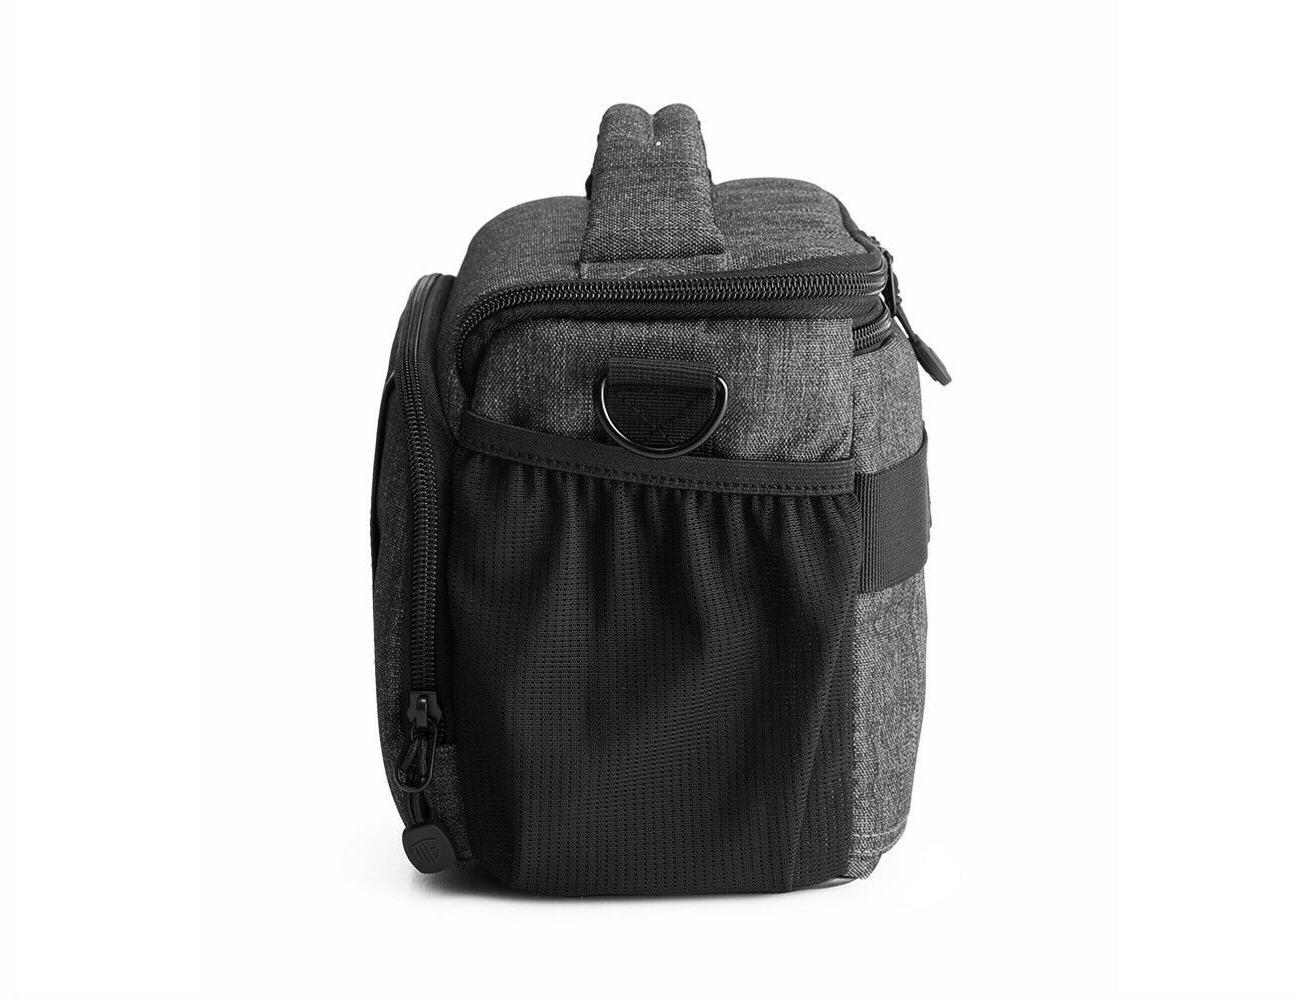 BAGSMART Bag for SLR/DSLR with Waterproof Rain Cover